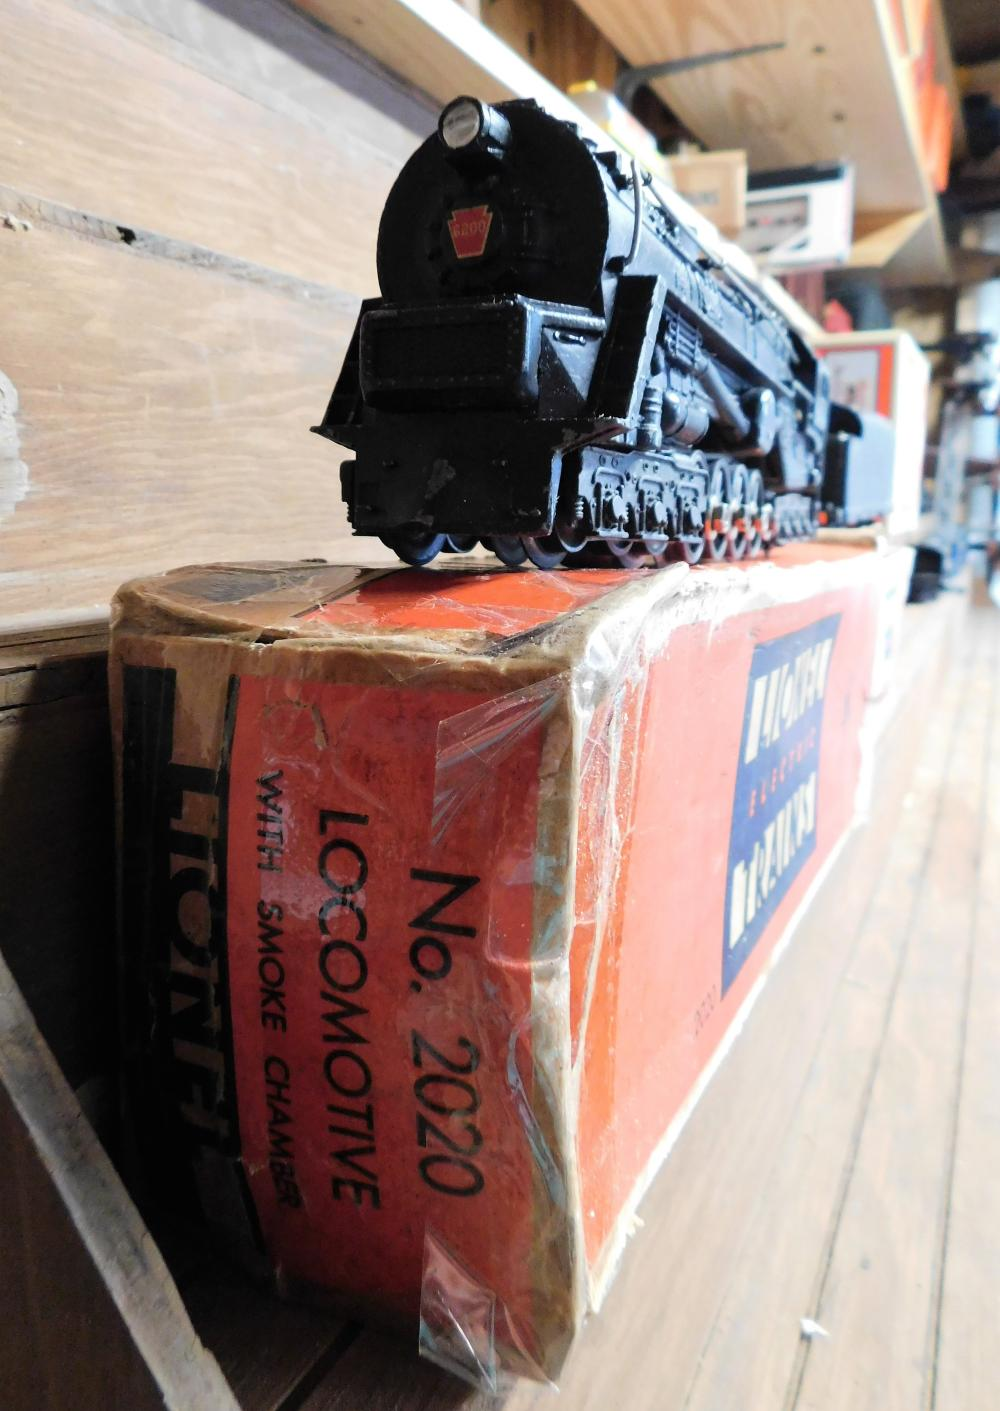 Lot 23: Lionel 2020 locomotive in box w/ 2466 wx tender w/ box